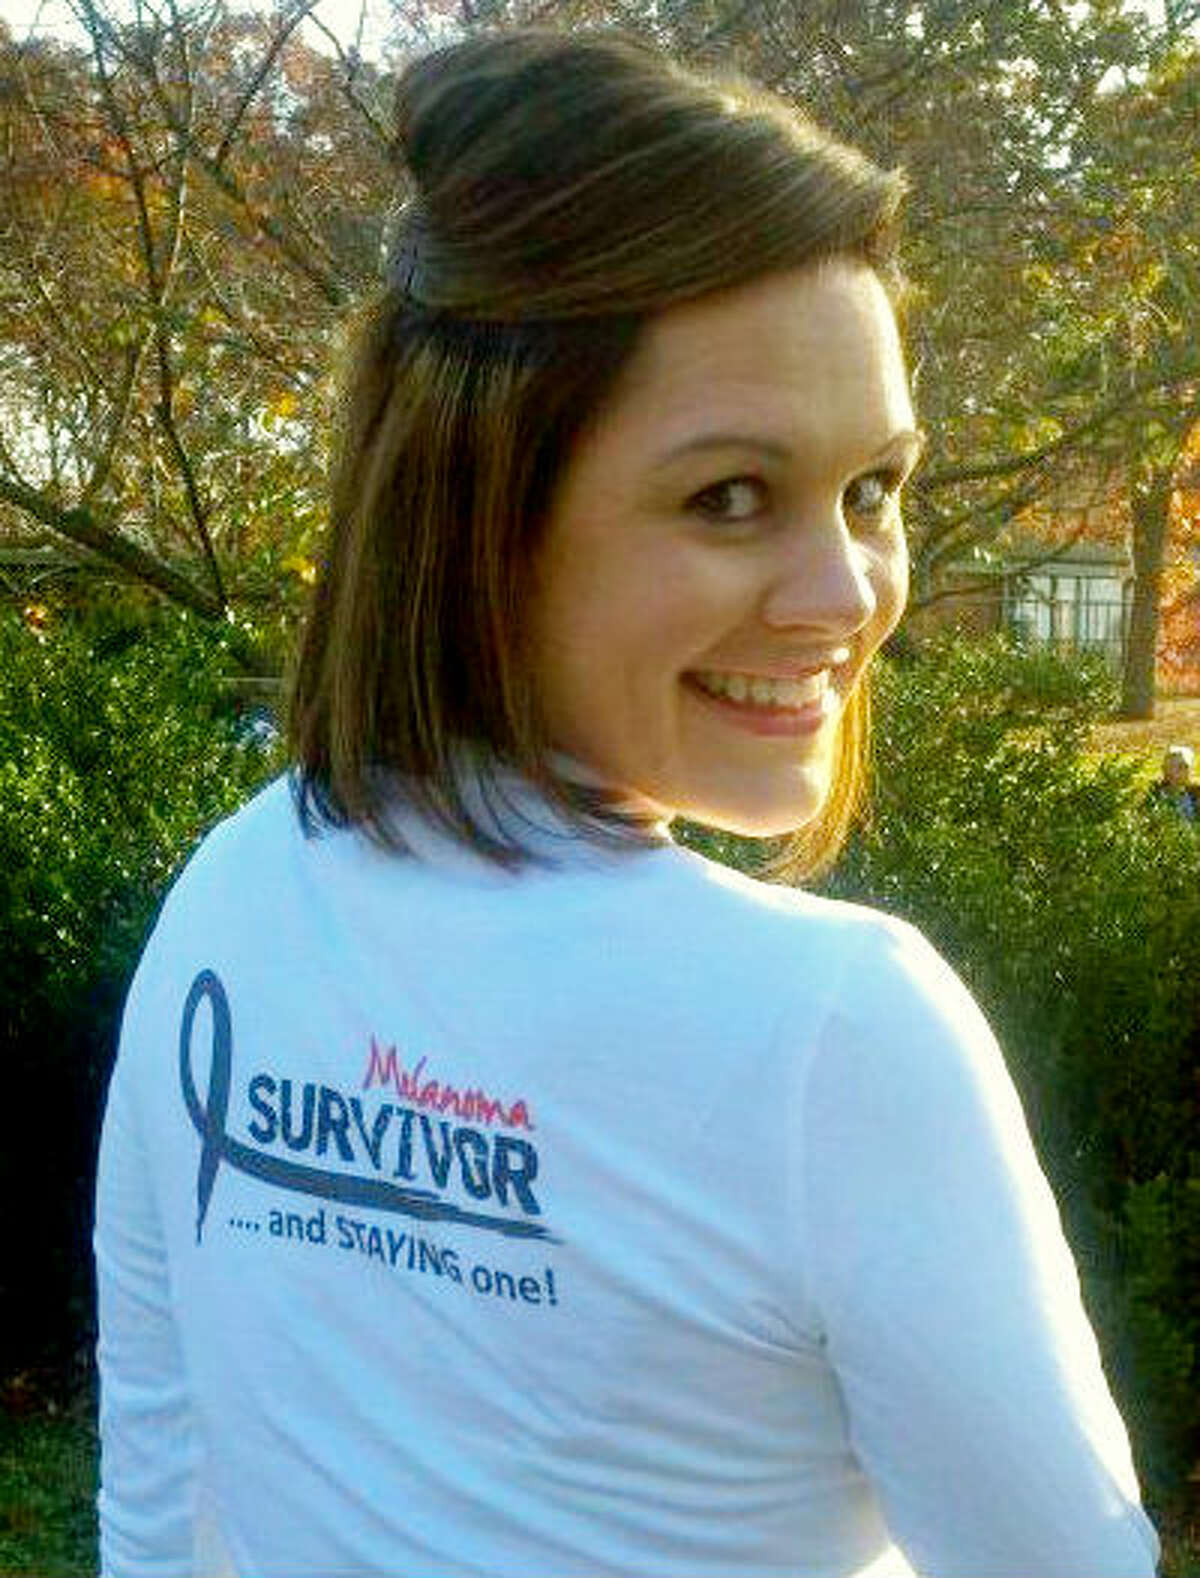 Chelsea Price, a survivor of melanoma. (FairWarning)